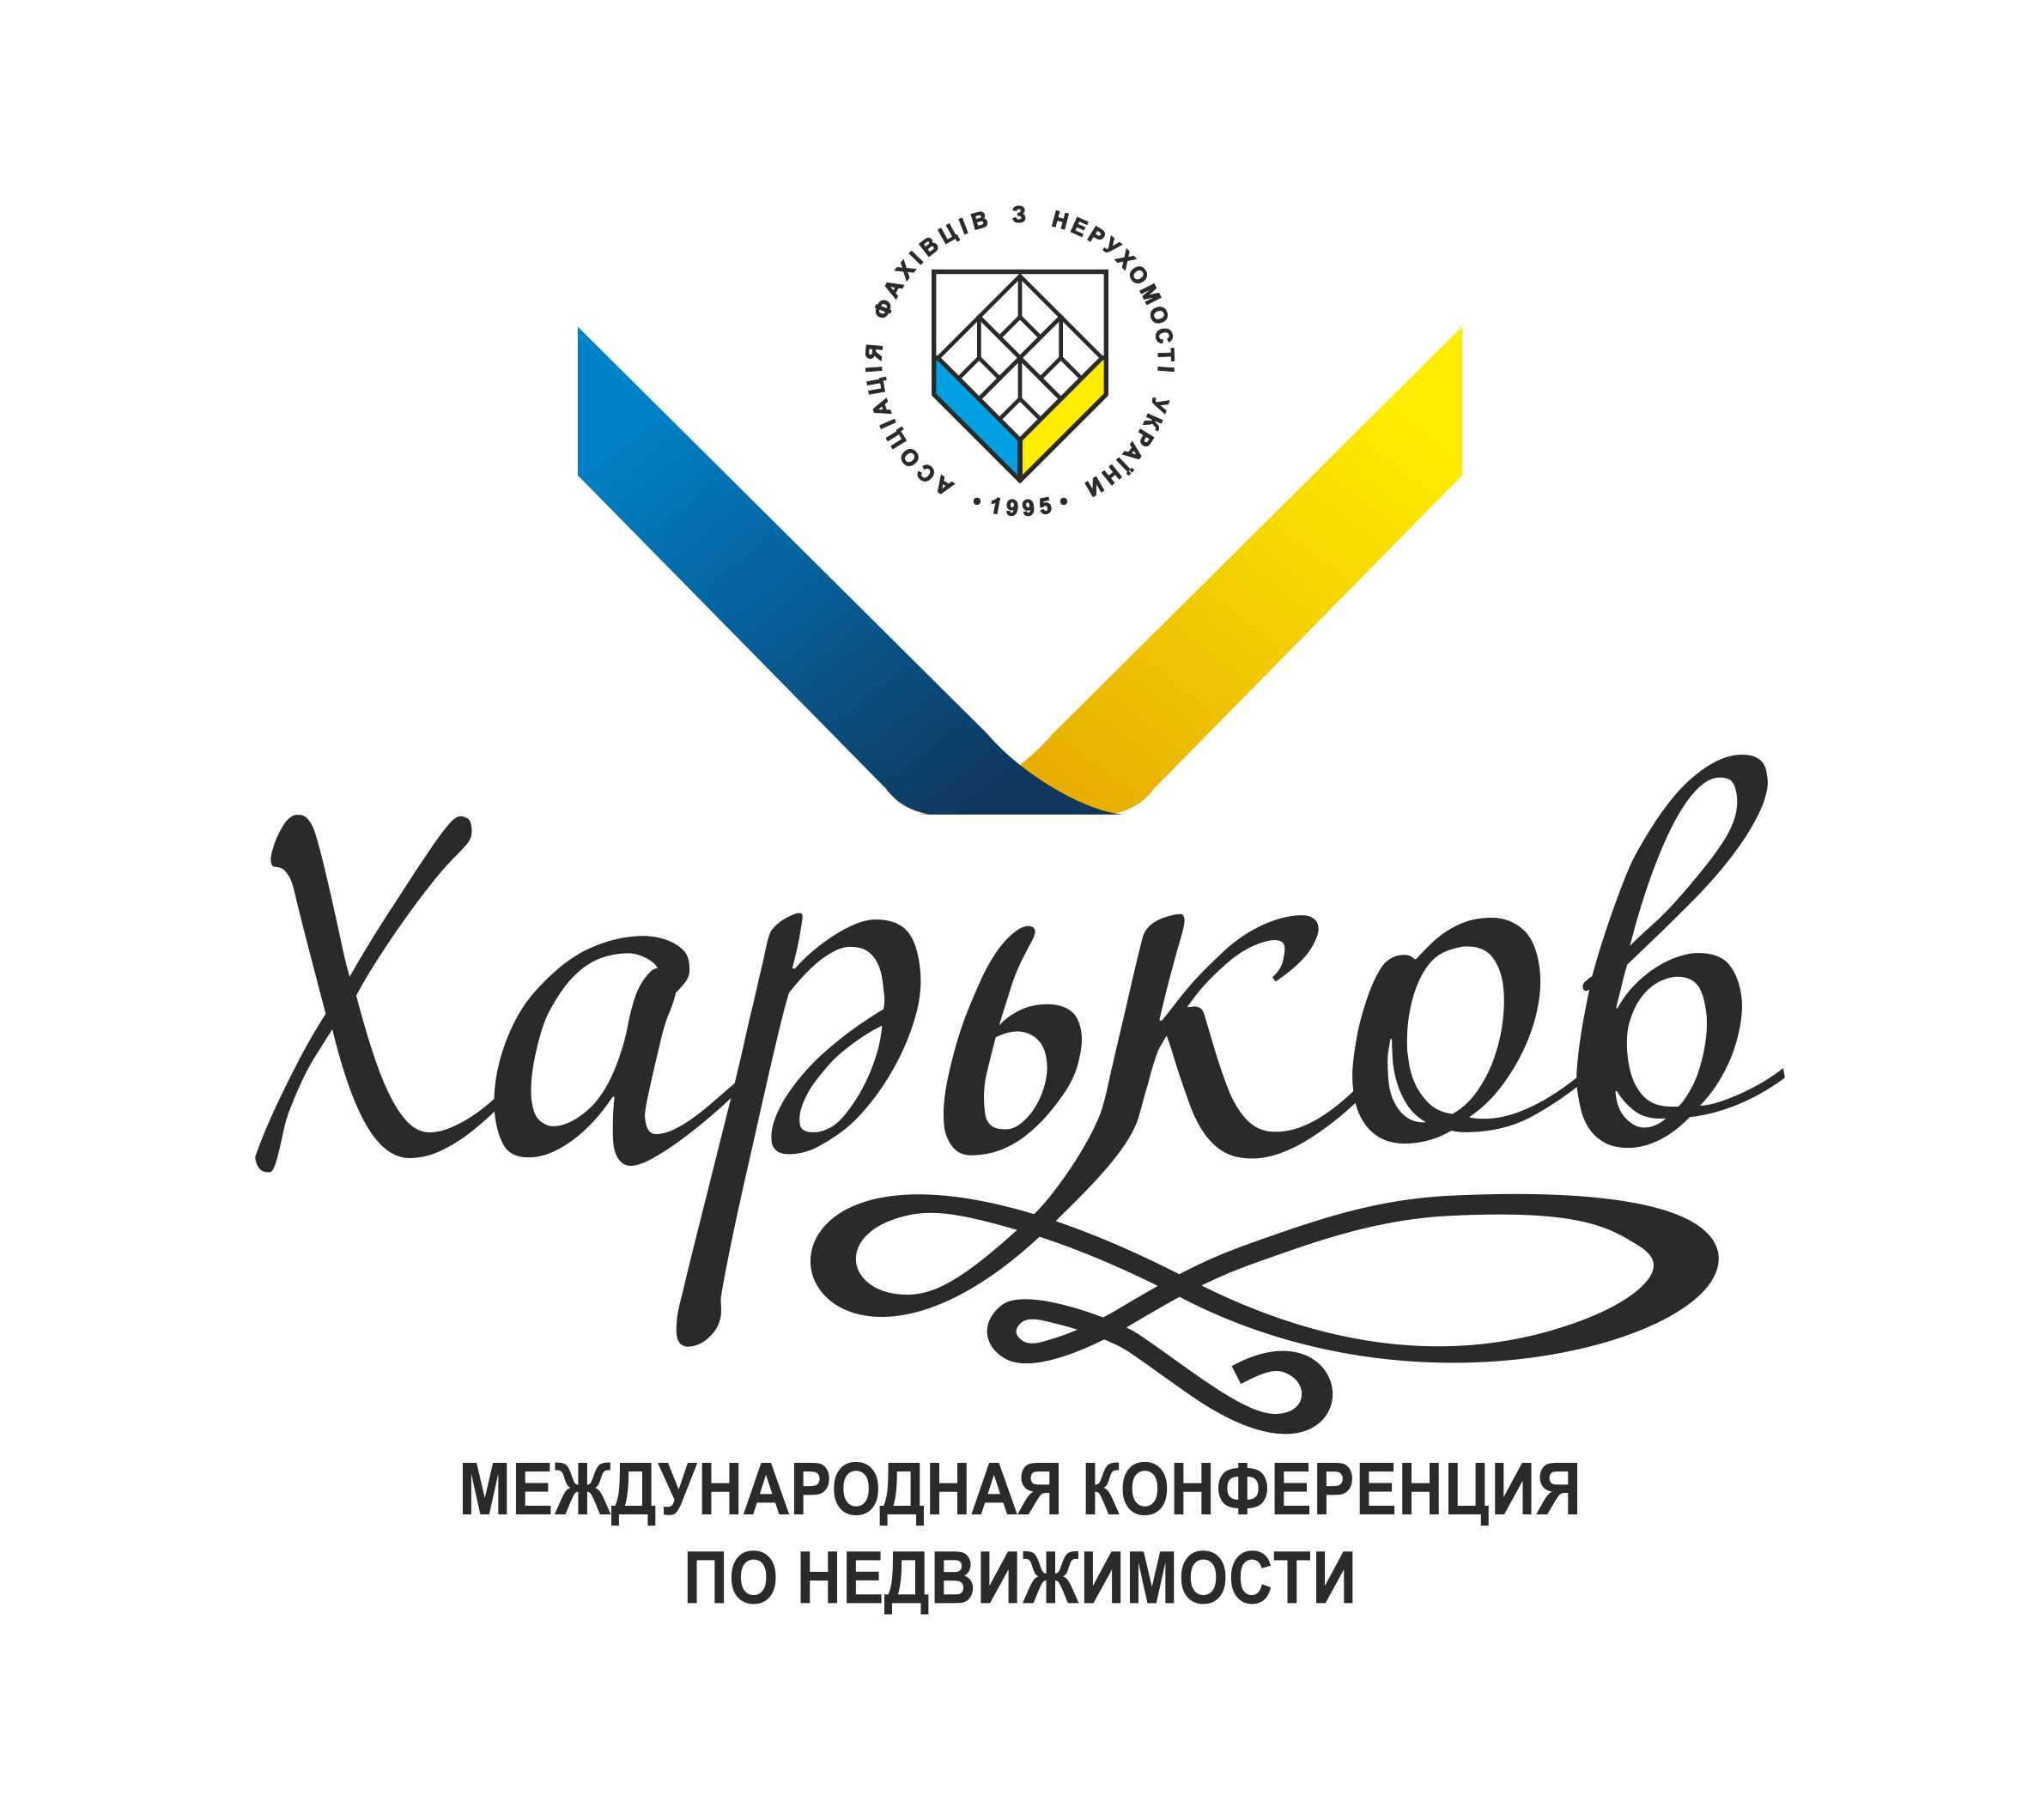 logo_Kharkov.jpg